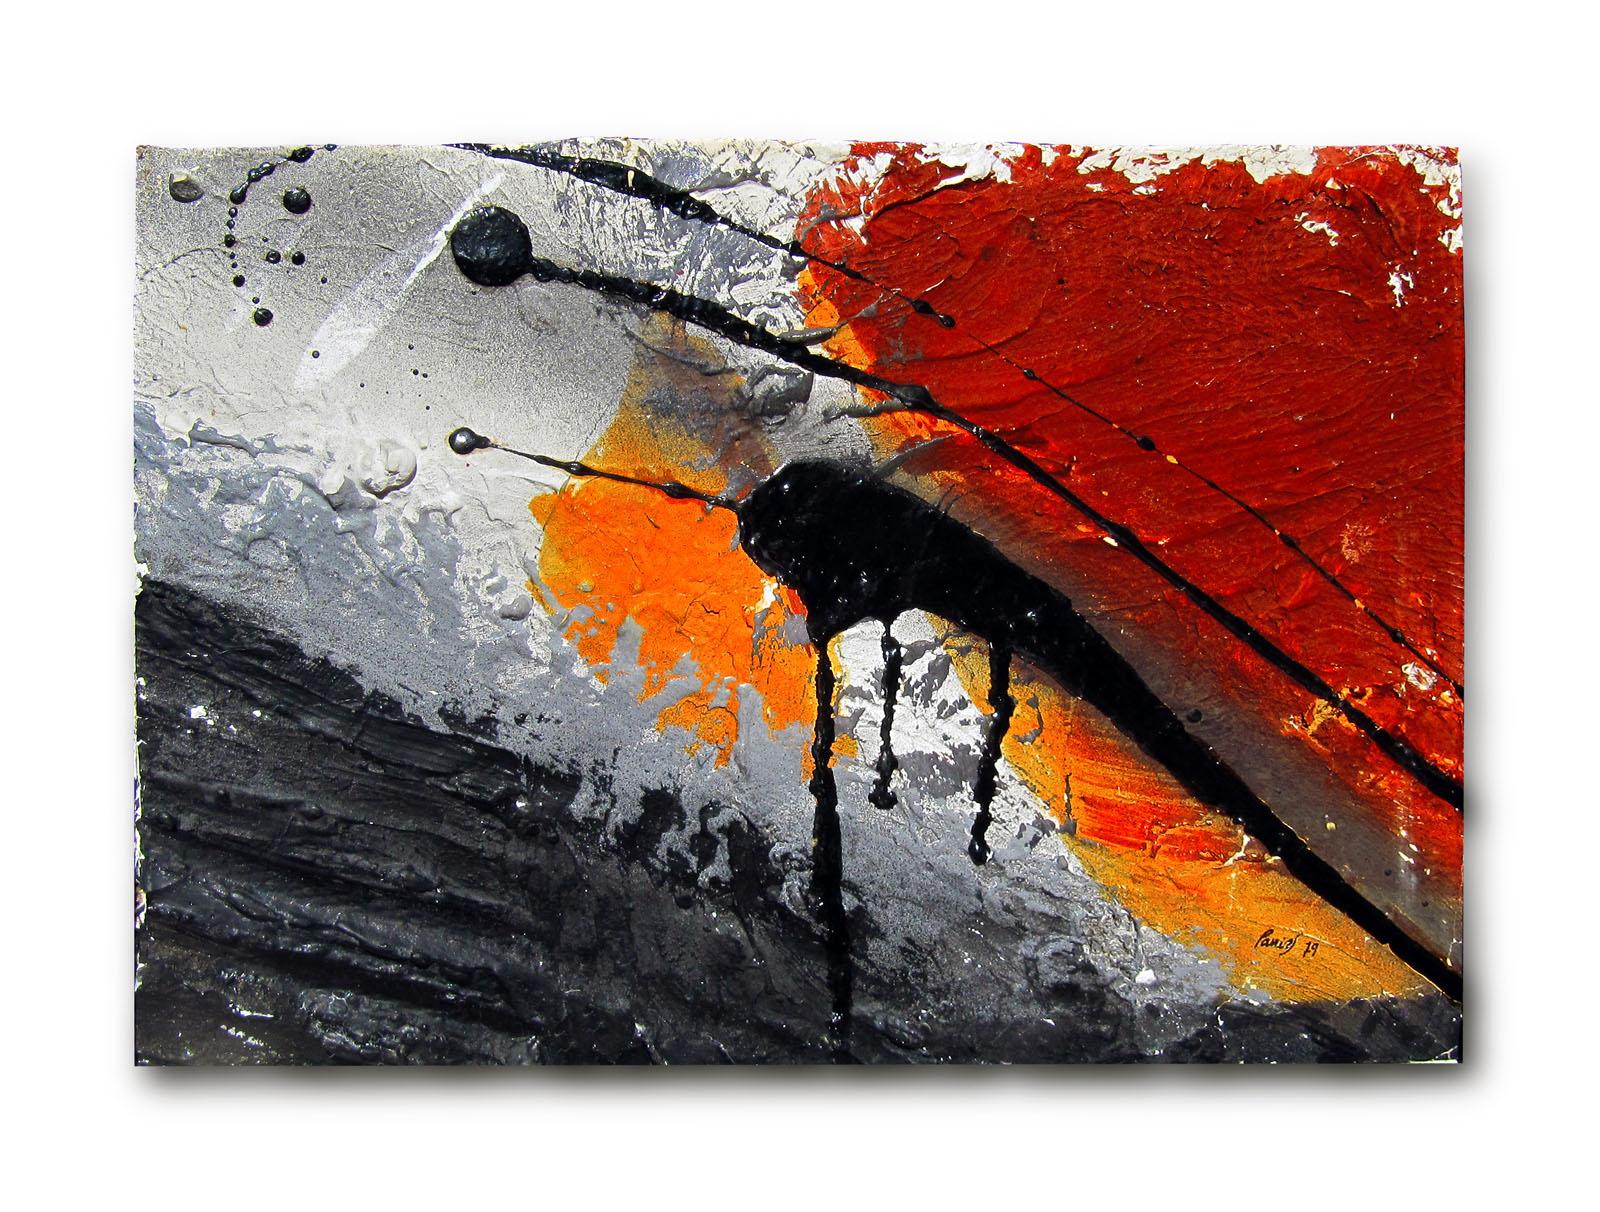 panies-danielvillalobos-spanish-painting-abstractexpressionism-34